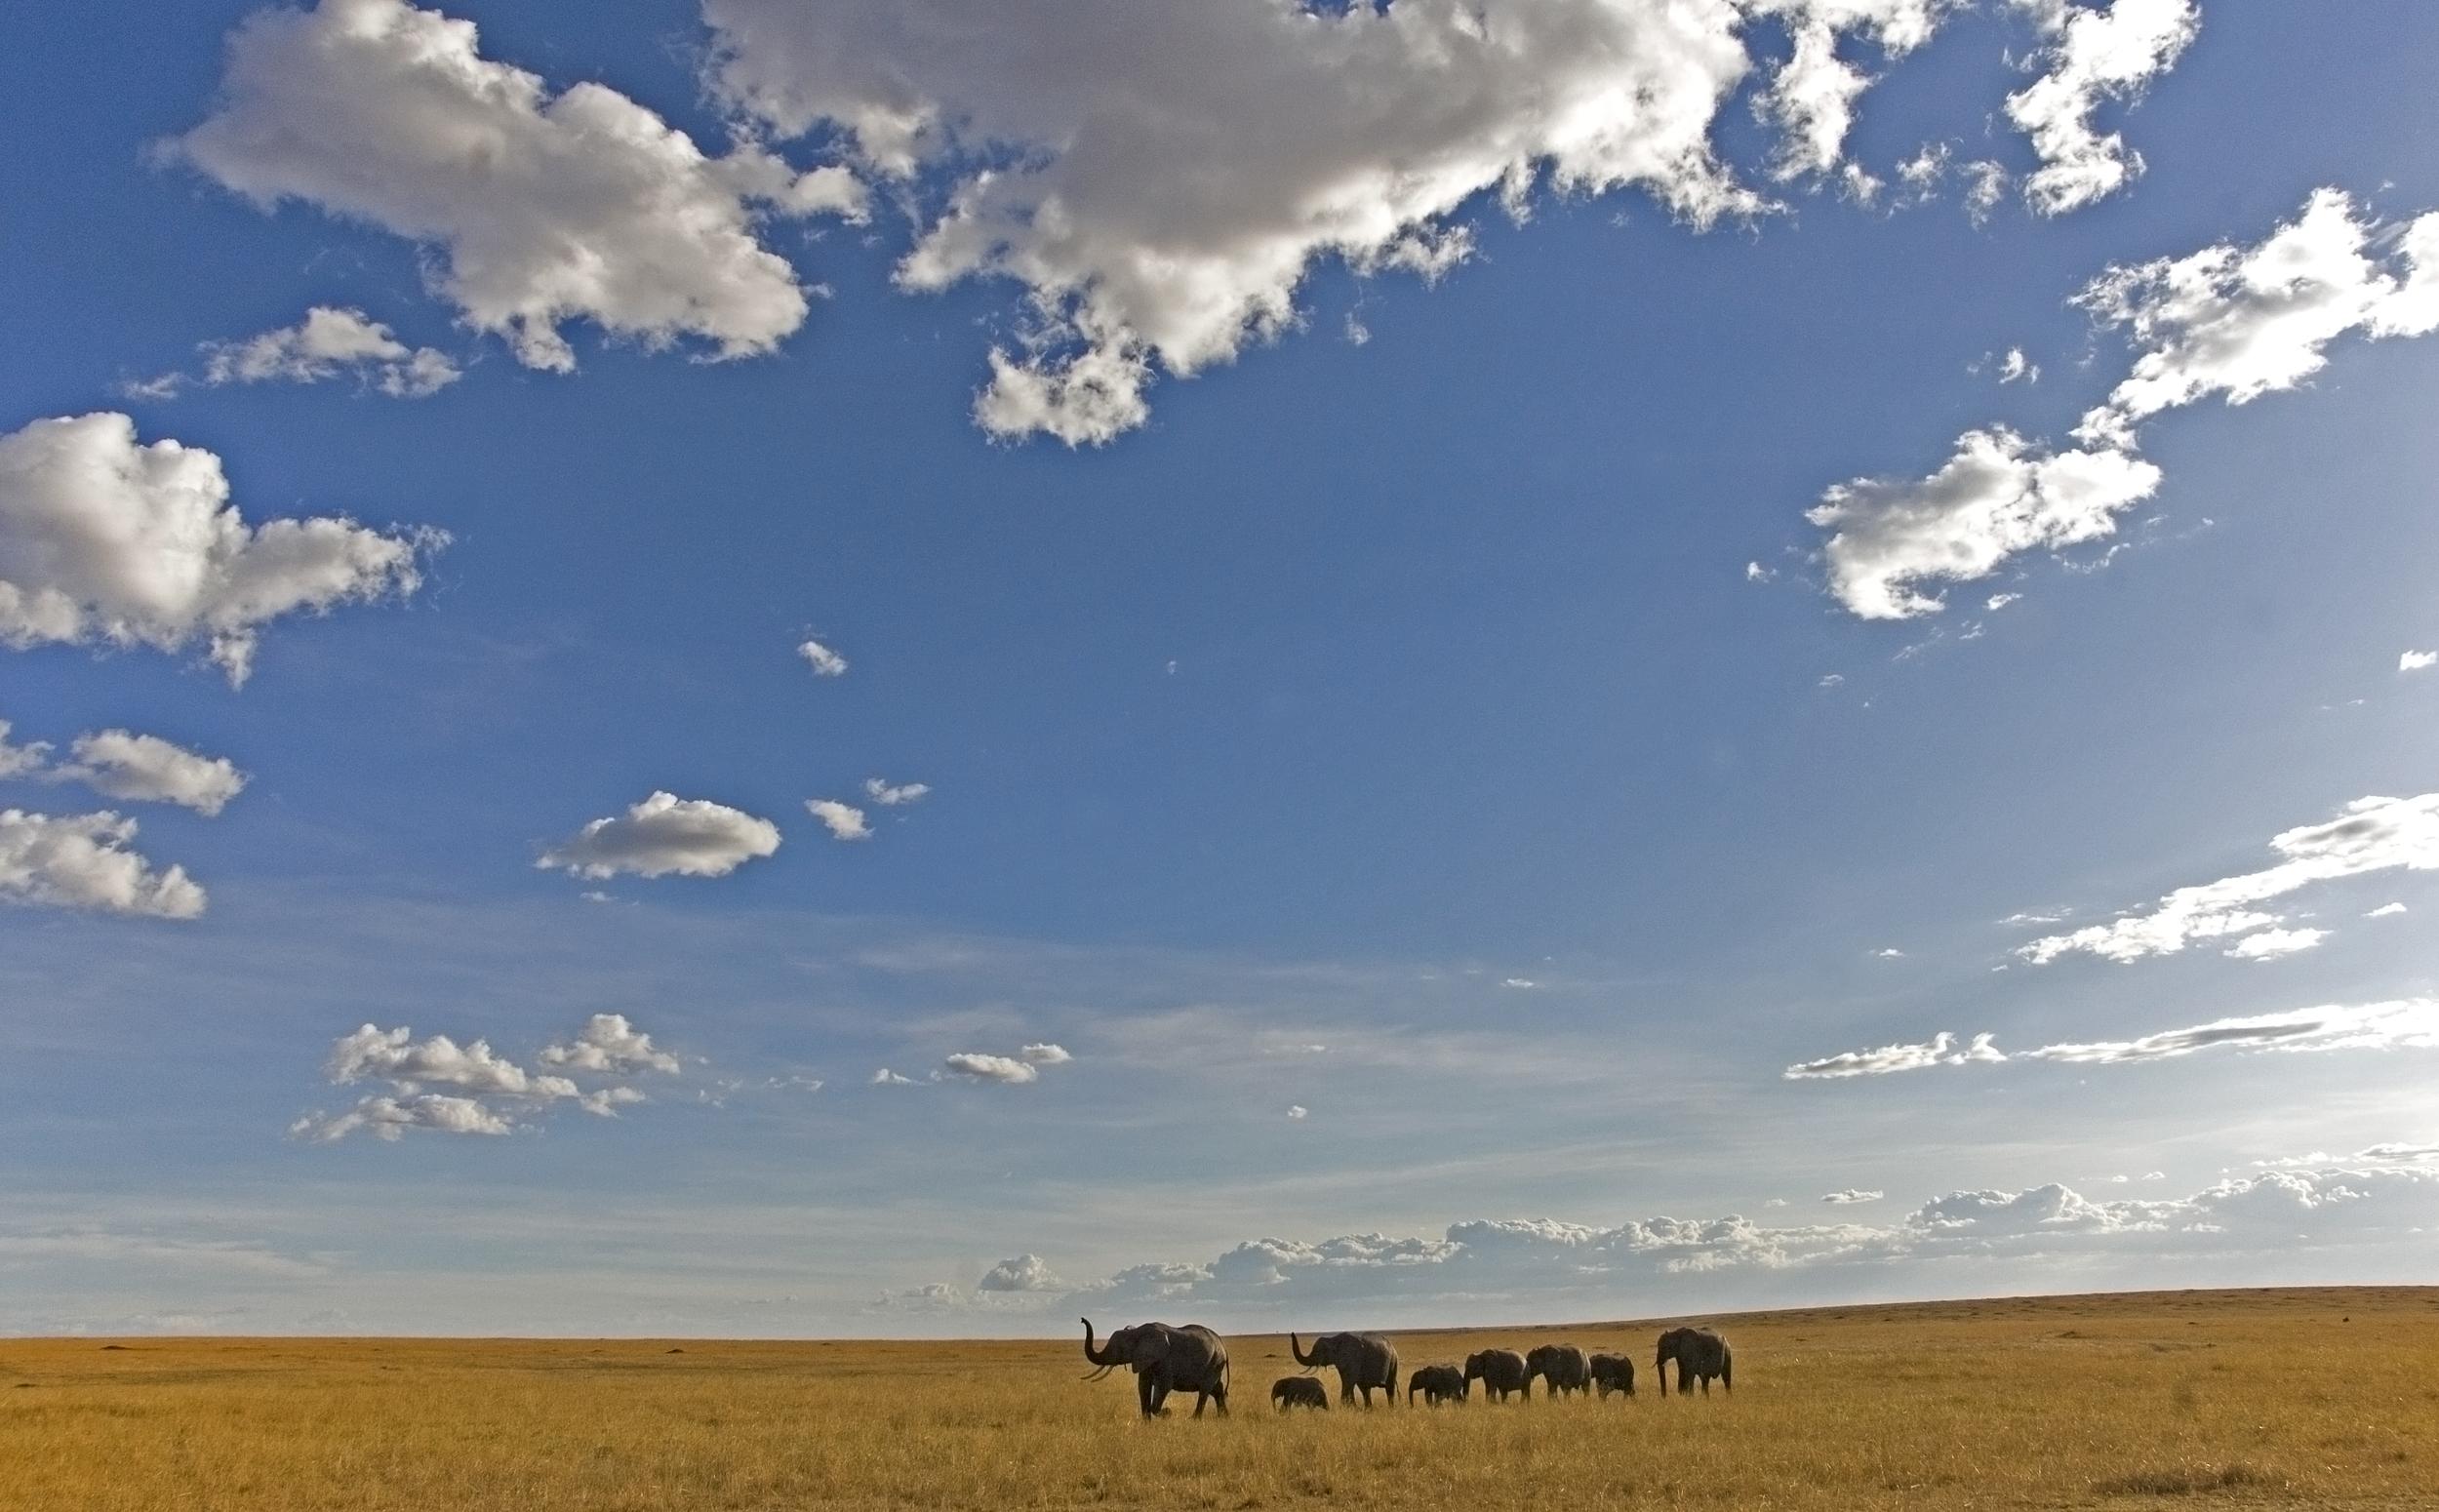 Breeding herd of elephants Mara.jpg